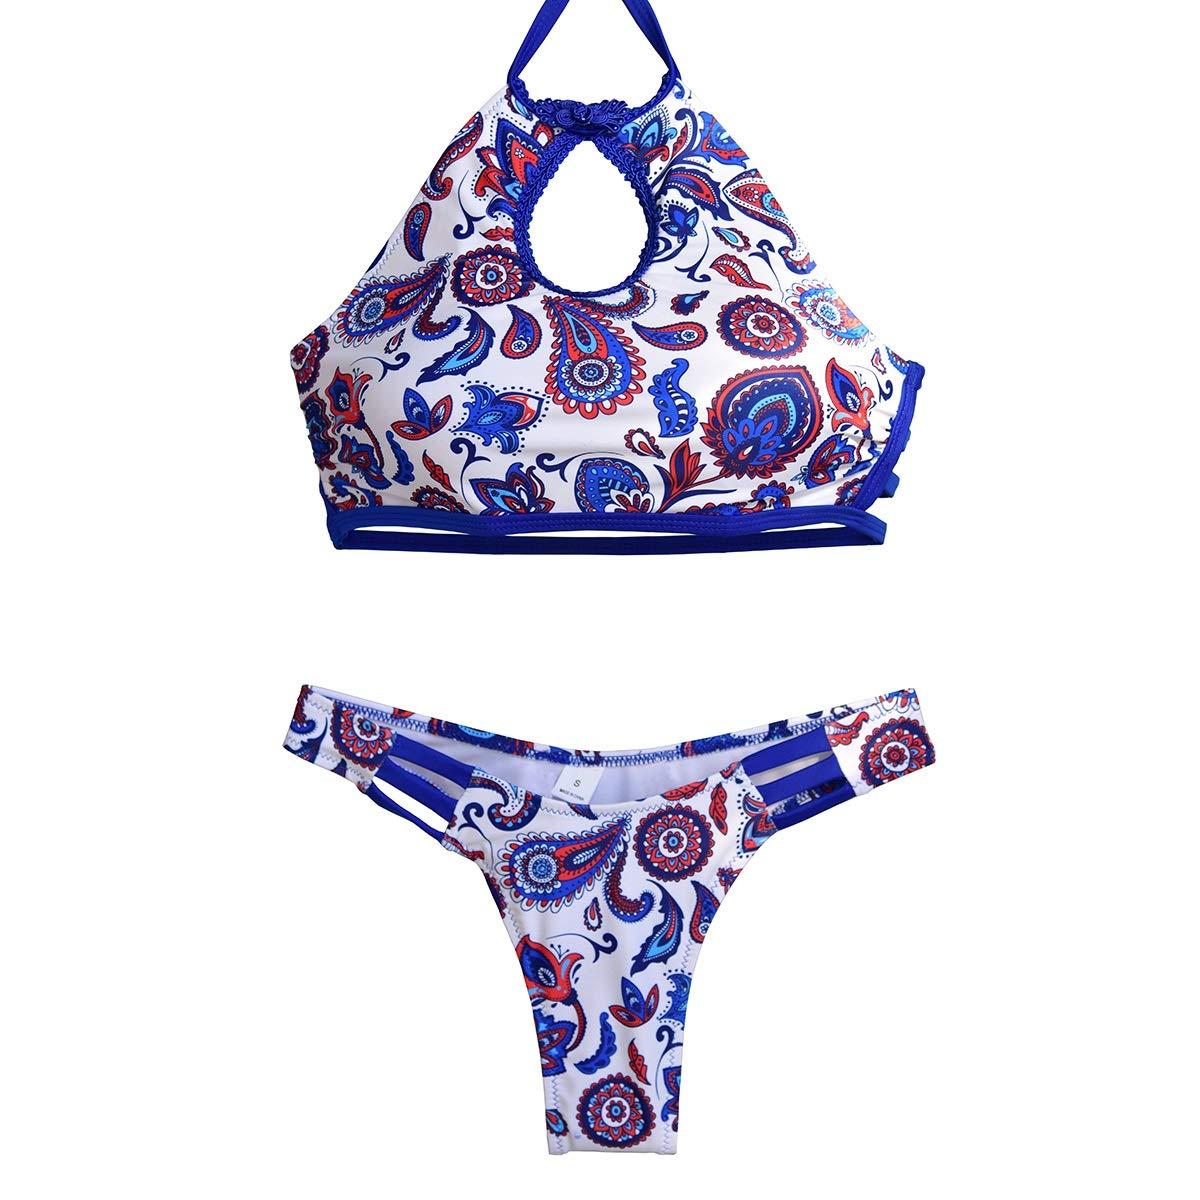 Medium HARDY-YI - Bikini Bikini - Bikini Haut de Gamme de Couleur Unie Bikini Dudou Bikini Split - 0554 (Taille   M)